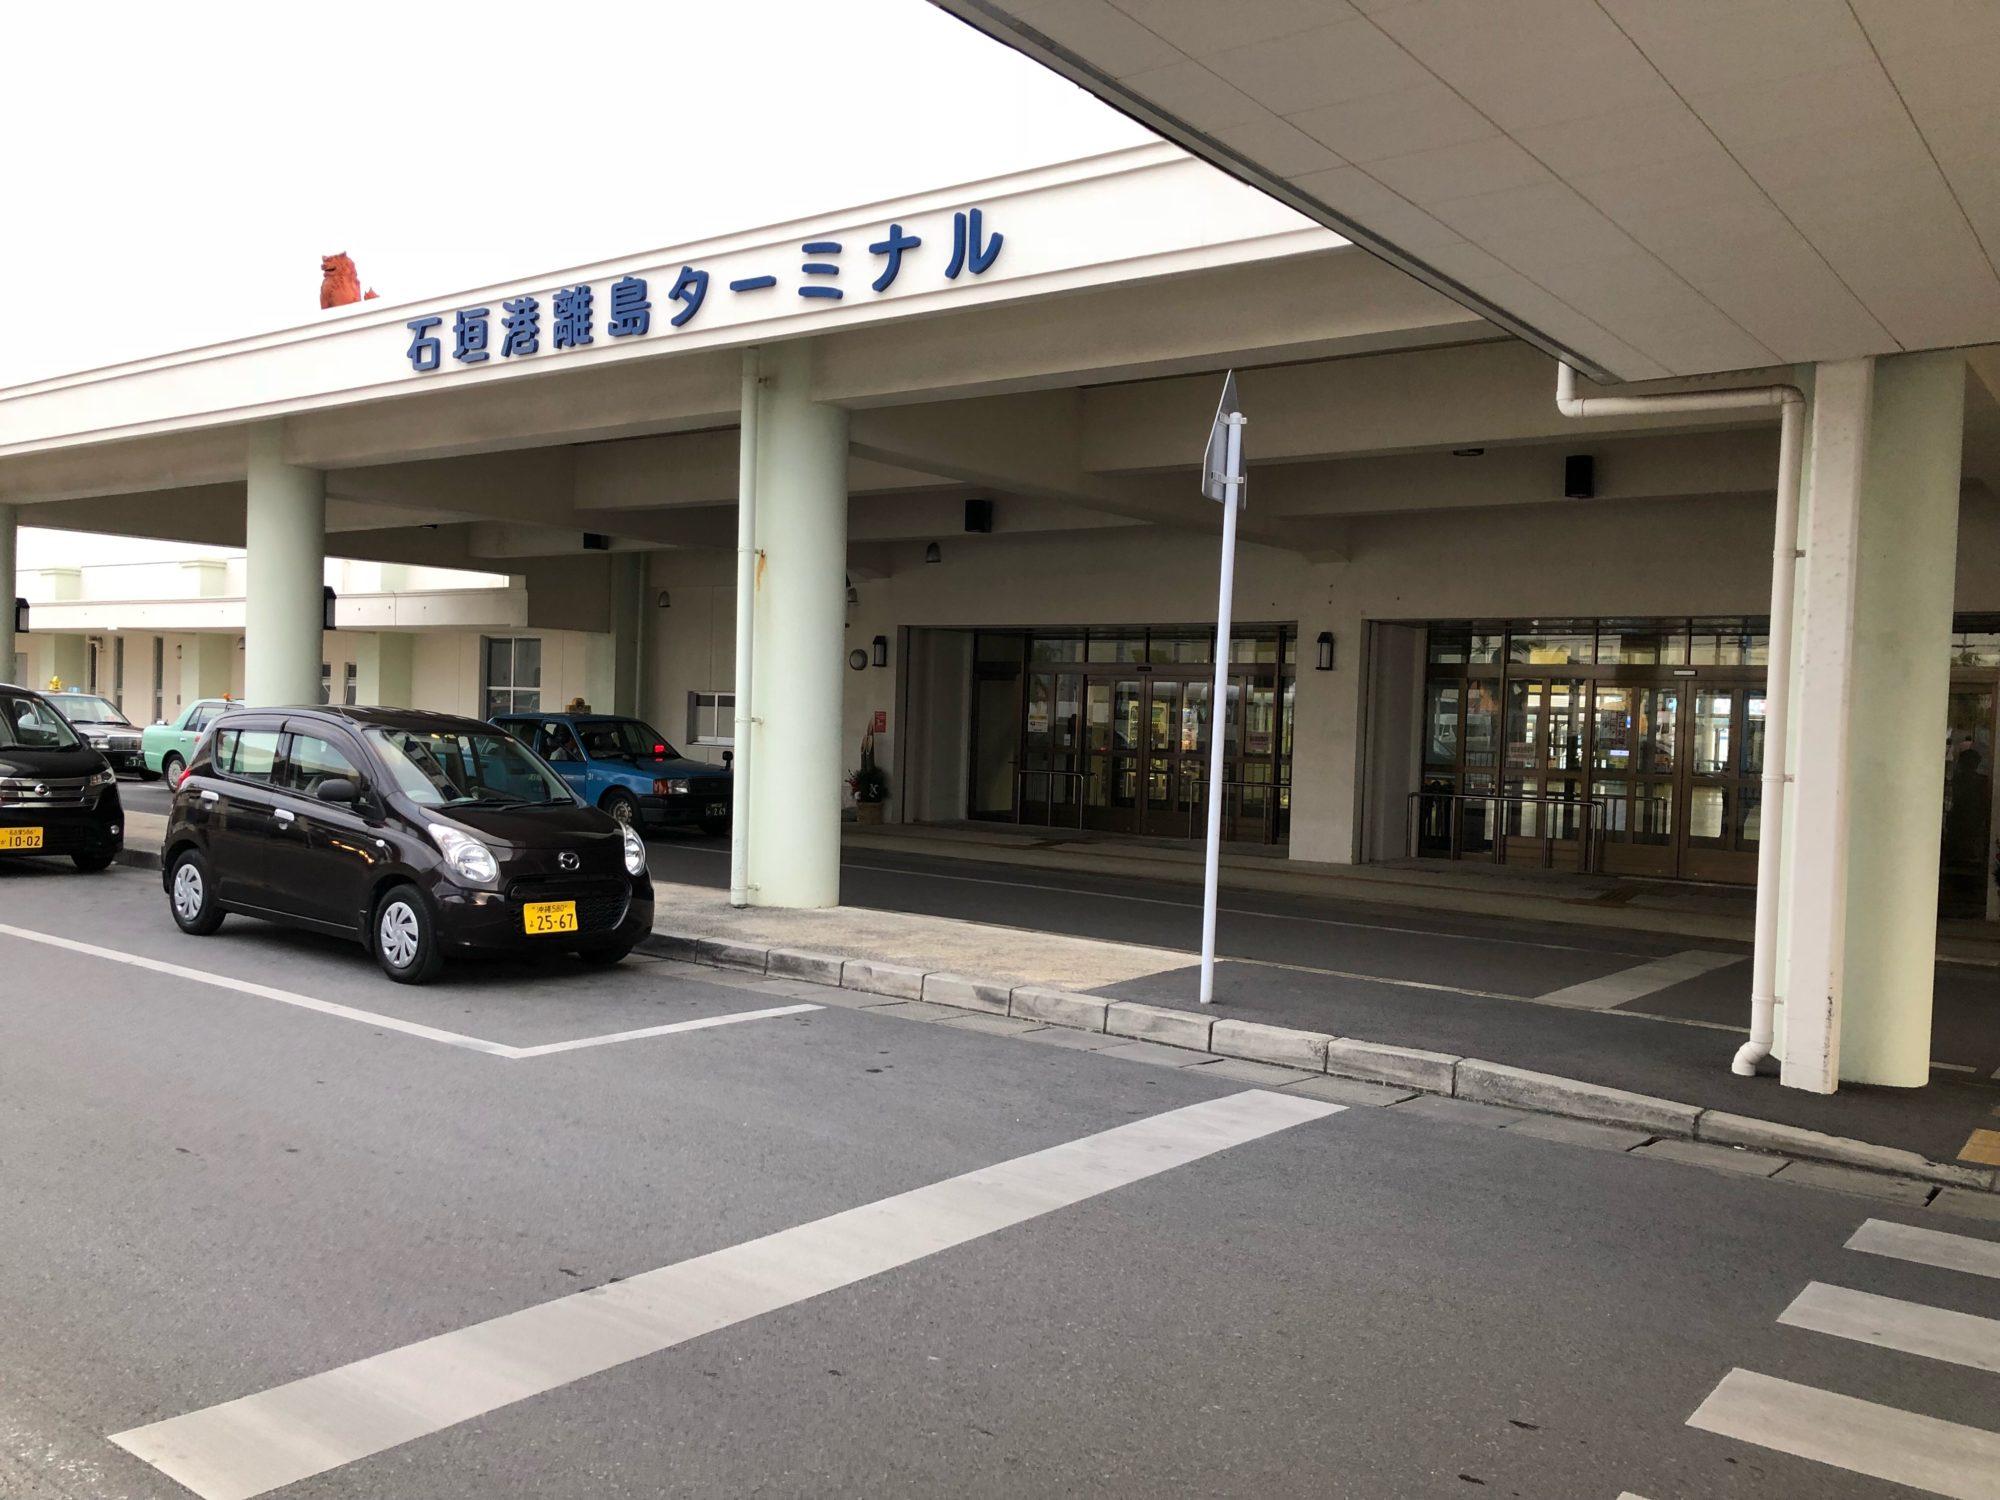 peachで関西空港から石垣空港到着→離島ターミナルへ向かう〜年末に行く、離島旅2017-2018〜